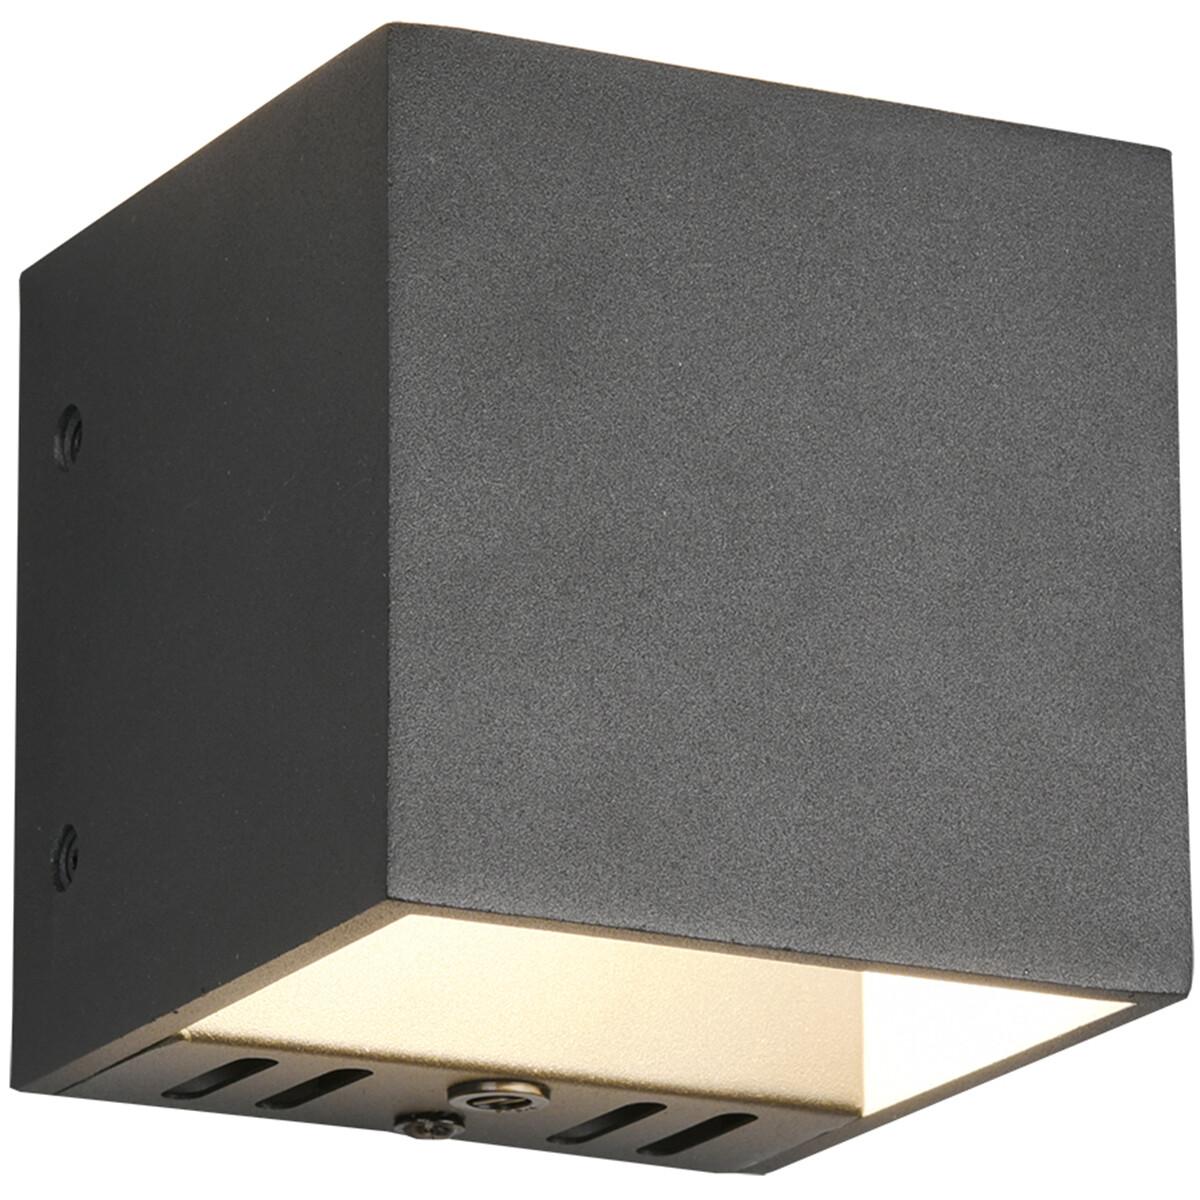 LED Wandlamp WiZ - Smart LED - Trion Figlio - 5W - Aanpasbare Kleur - RGBW - Vierkant - Mat Zwart -